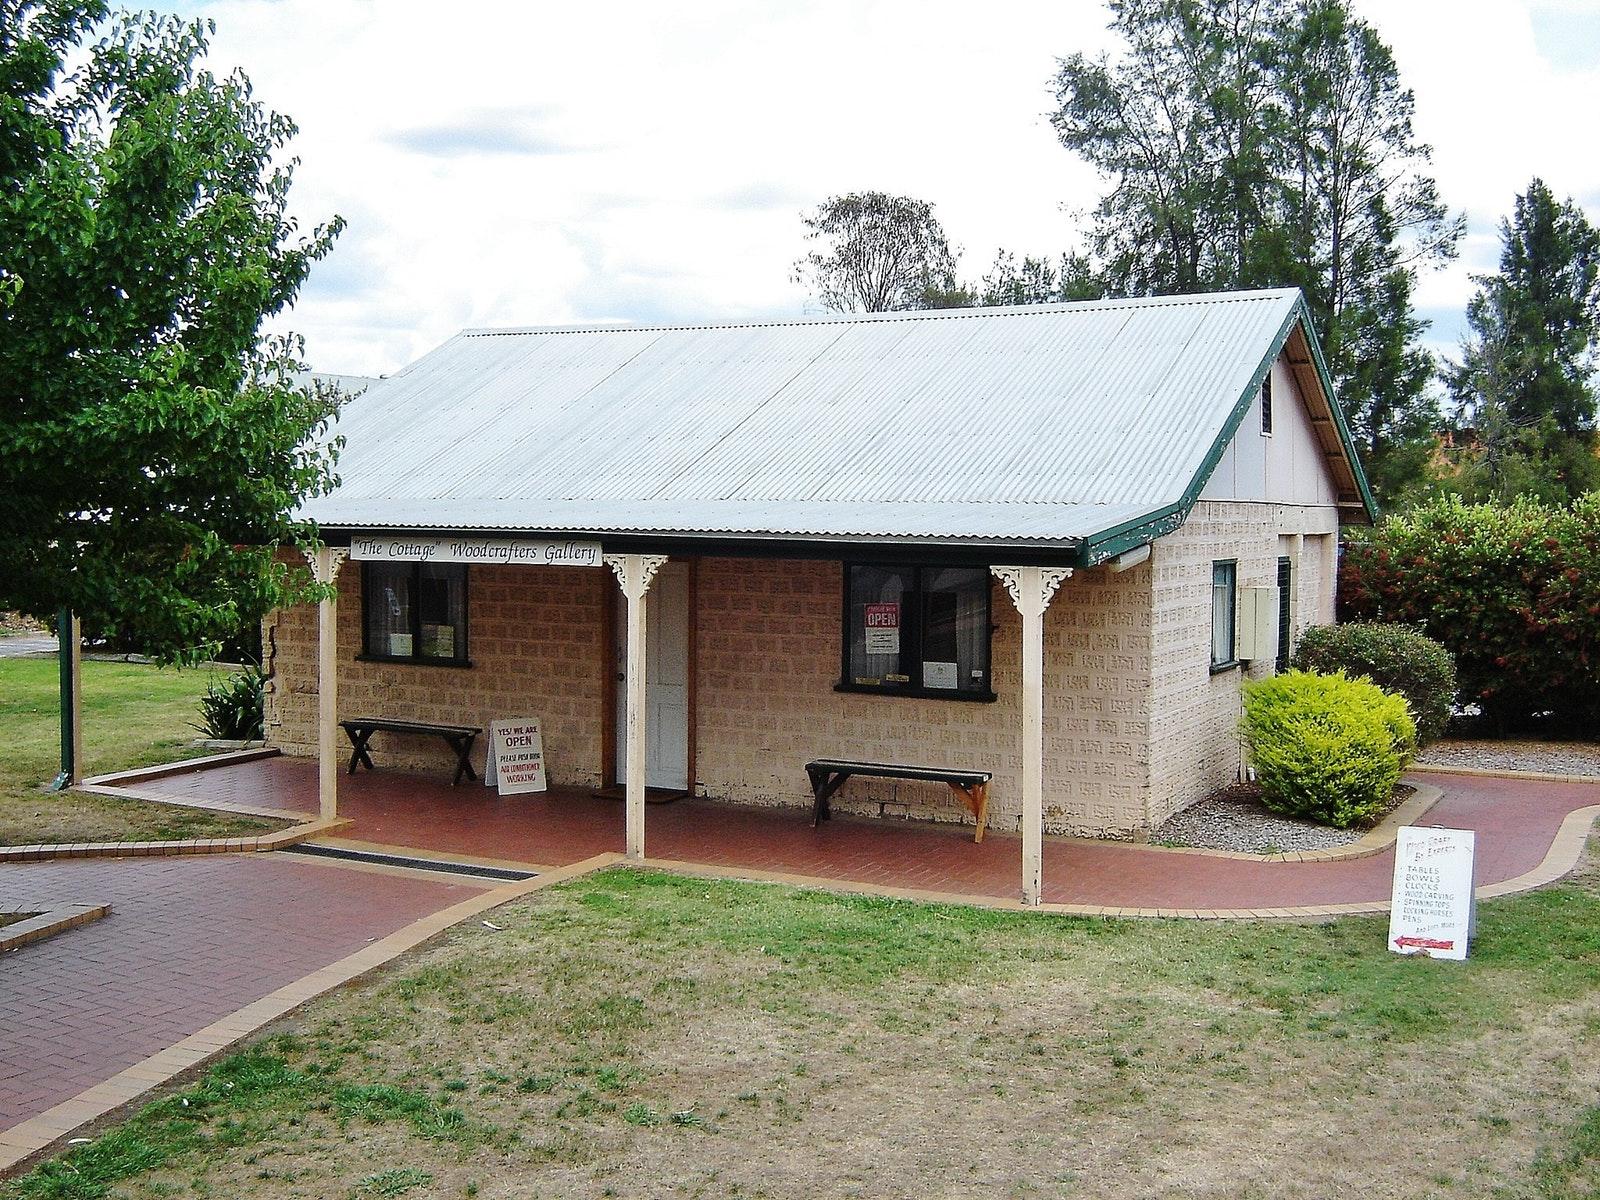 A-WW Inc. Cottage Gallery Shop